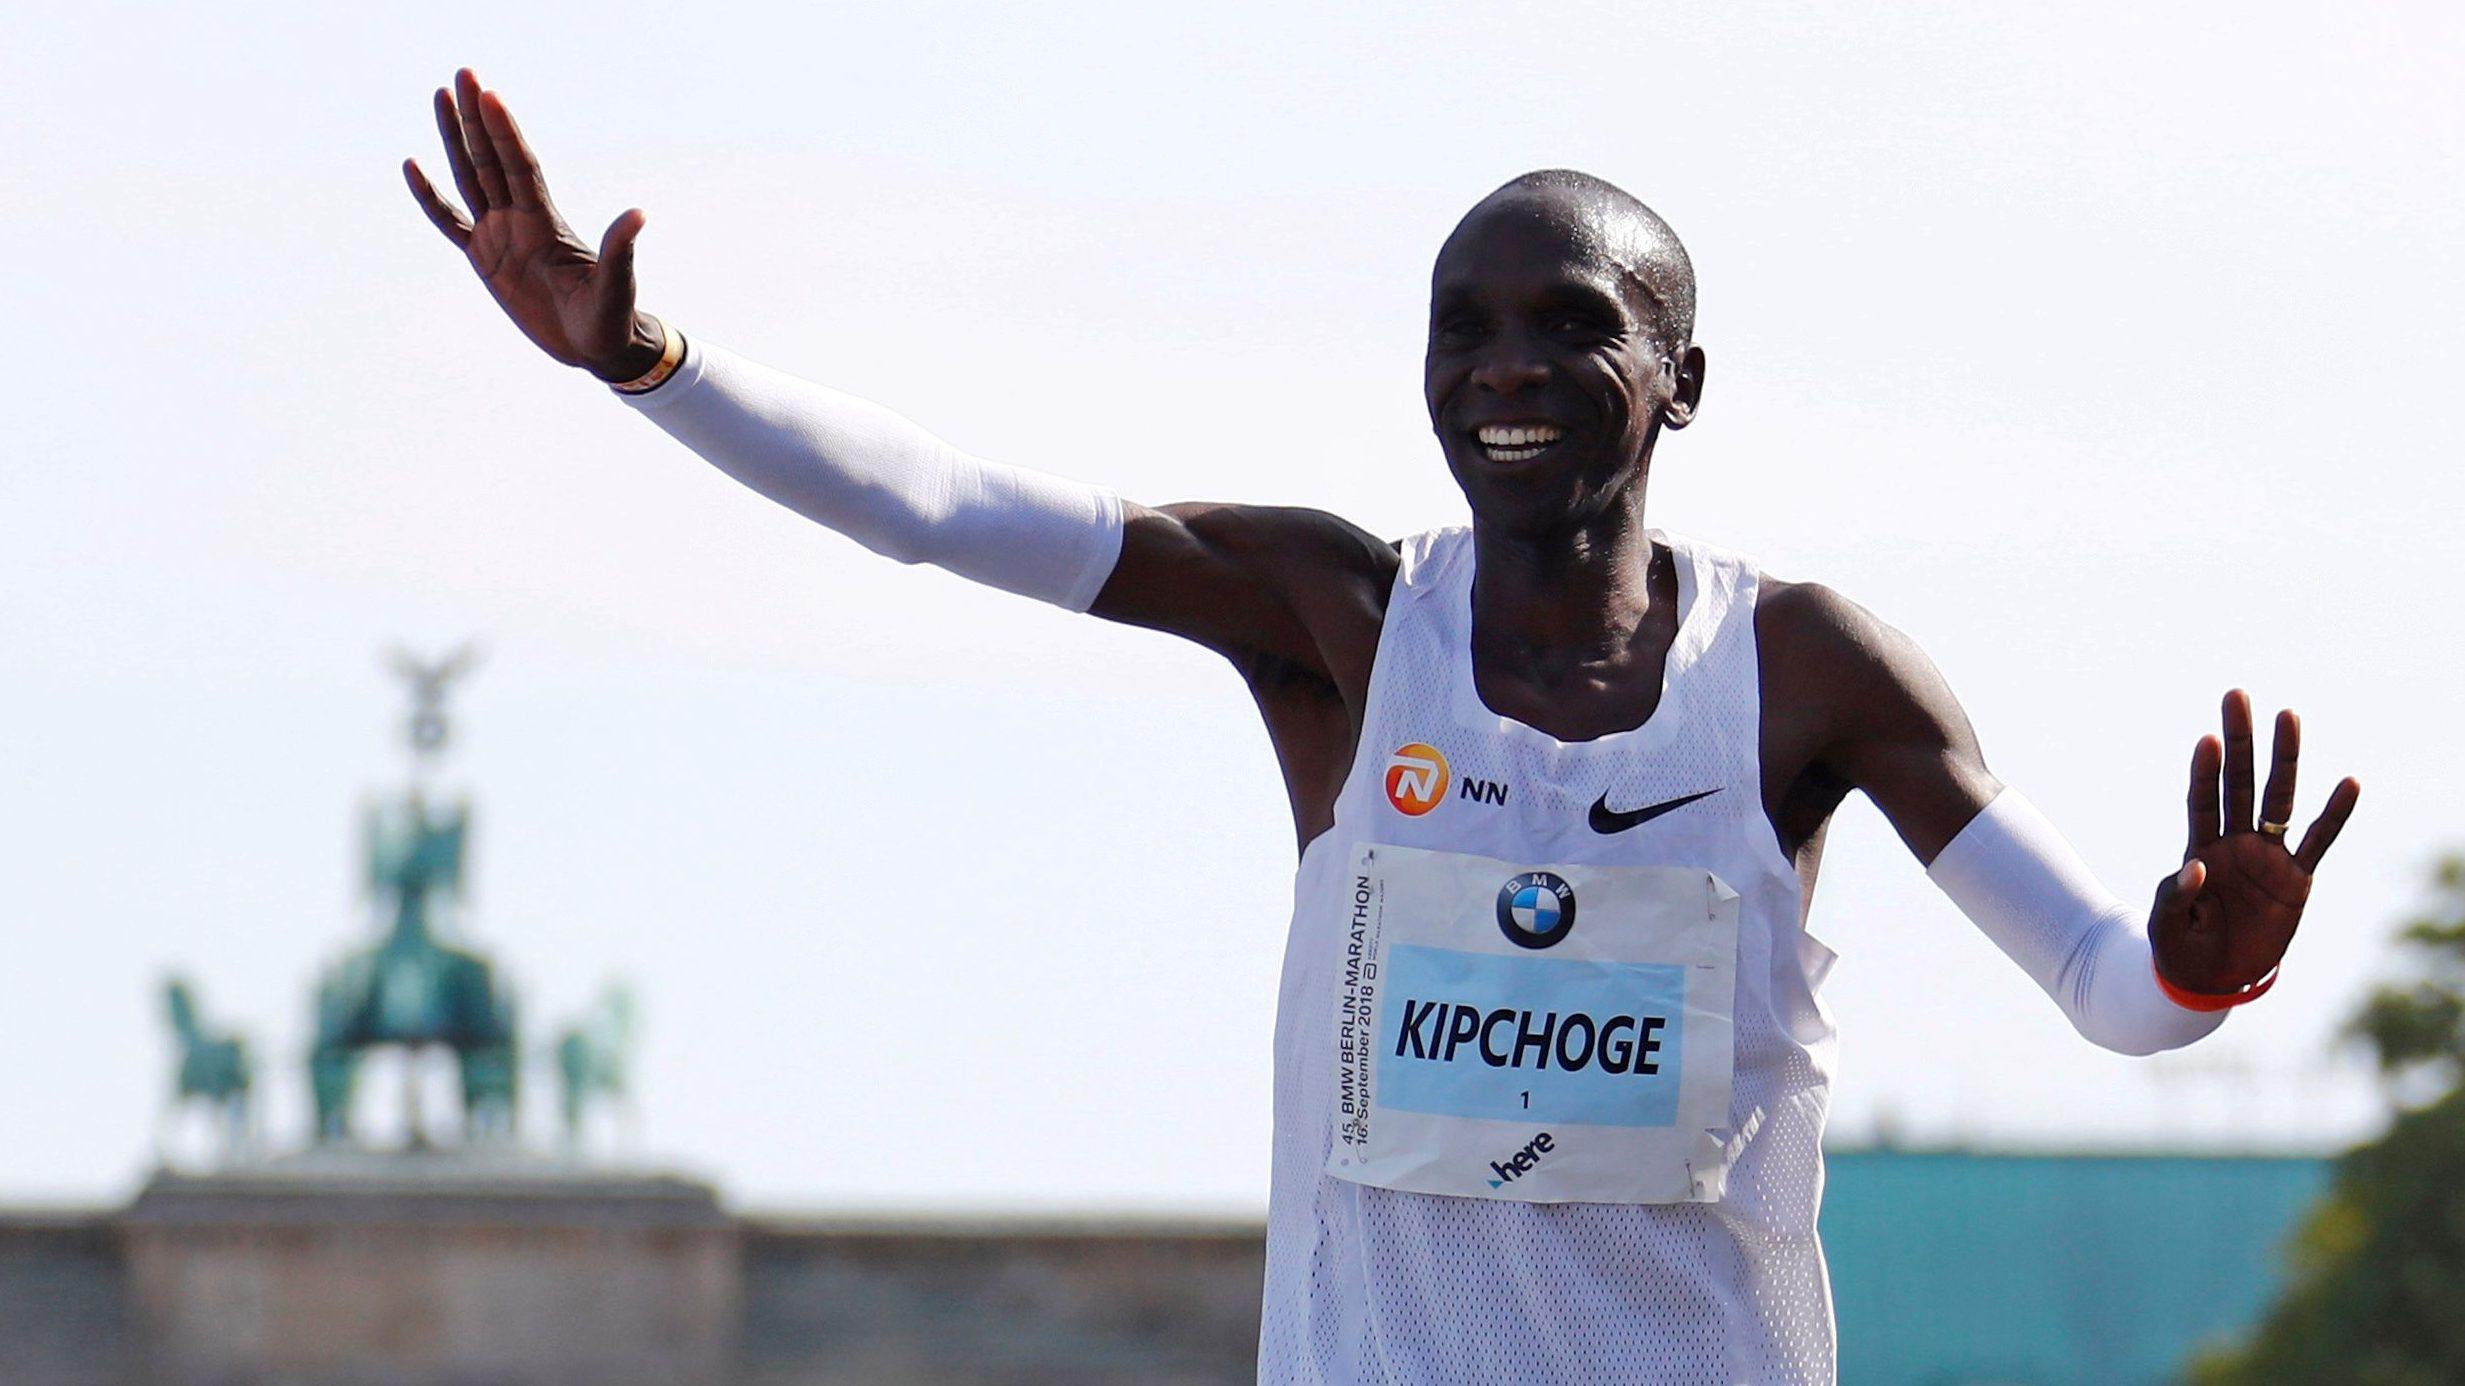 Eliud Kipchoge celebrates after winning the Berlin marathon.